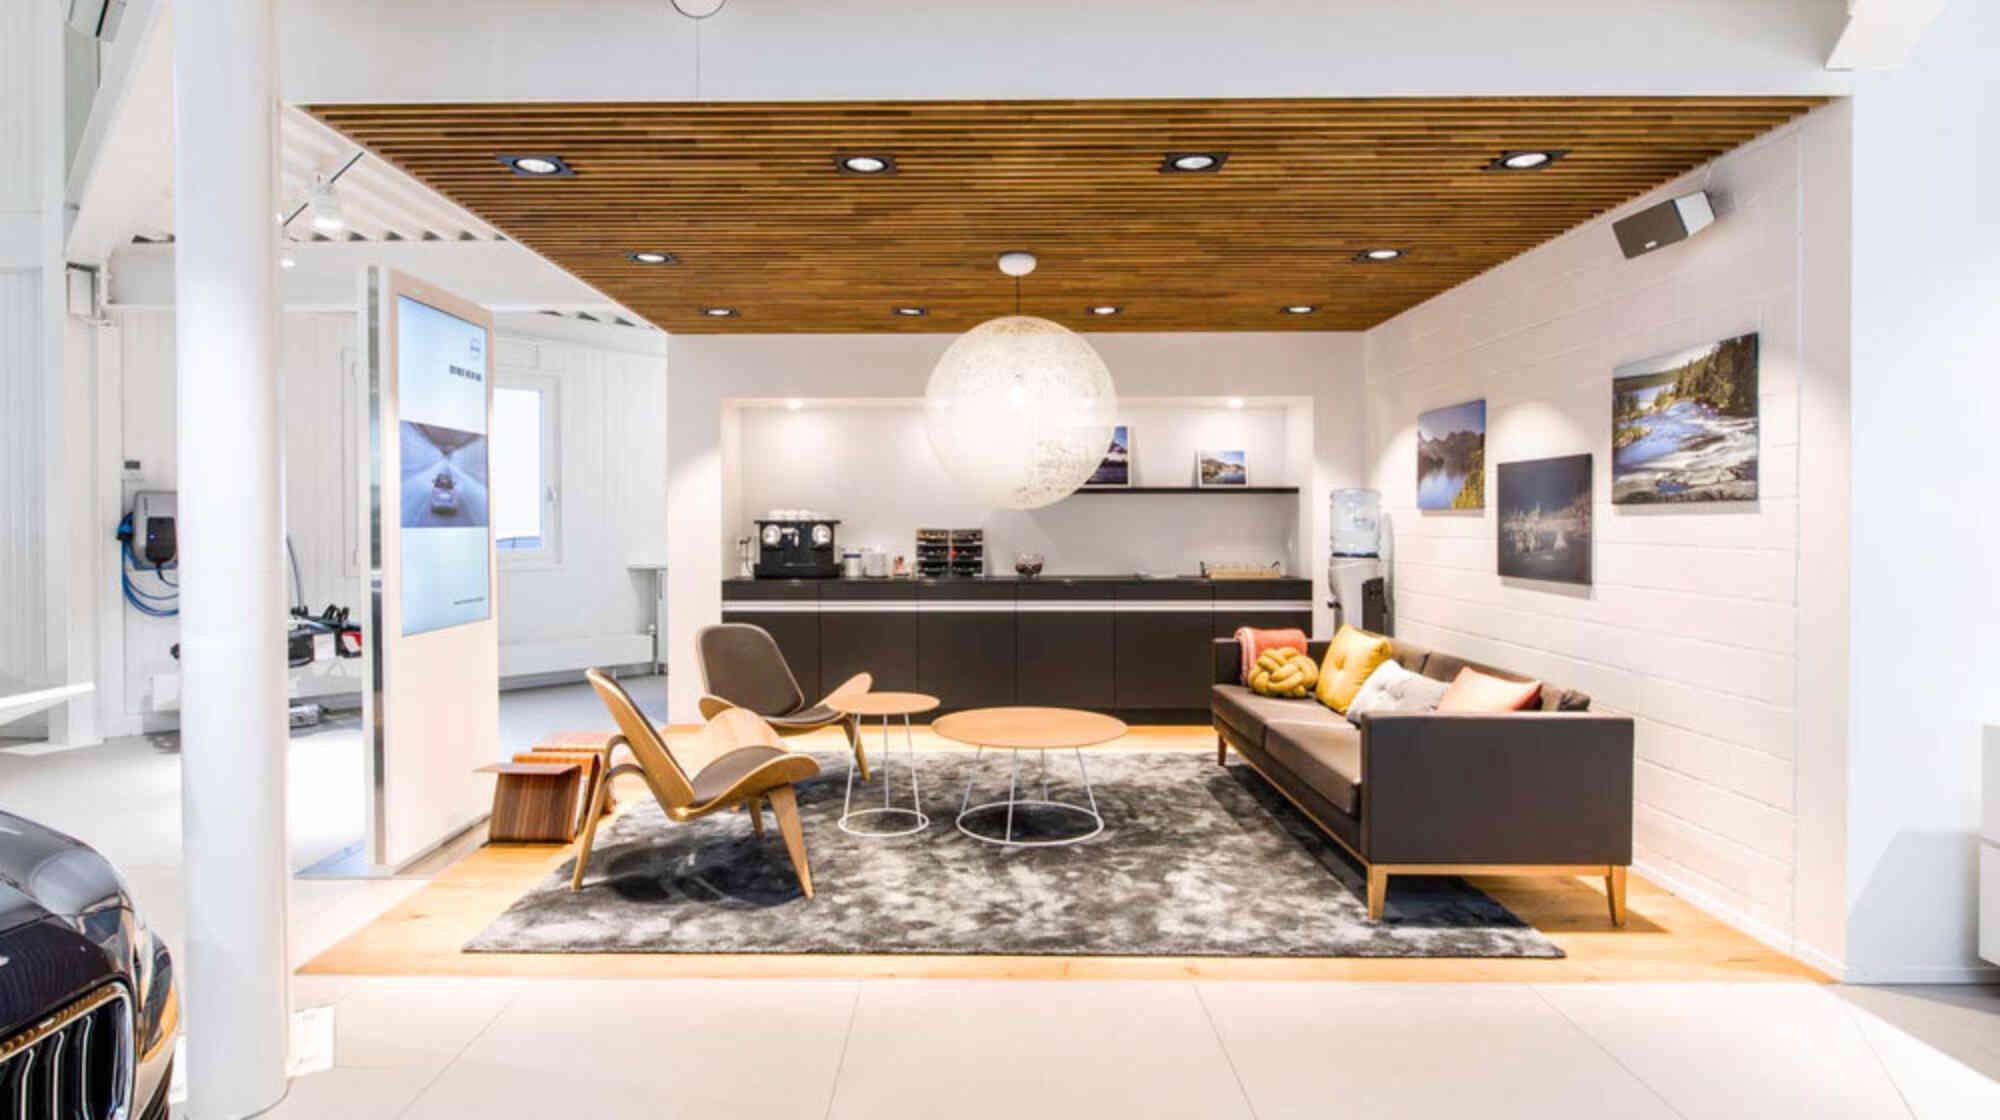 Central-Garage Wälty: Showroom